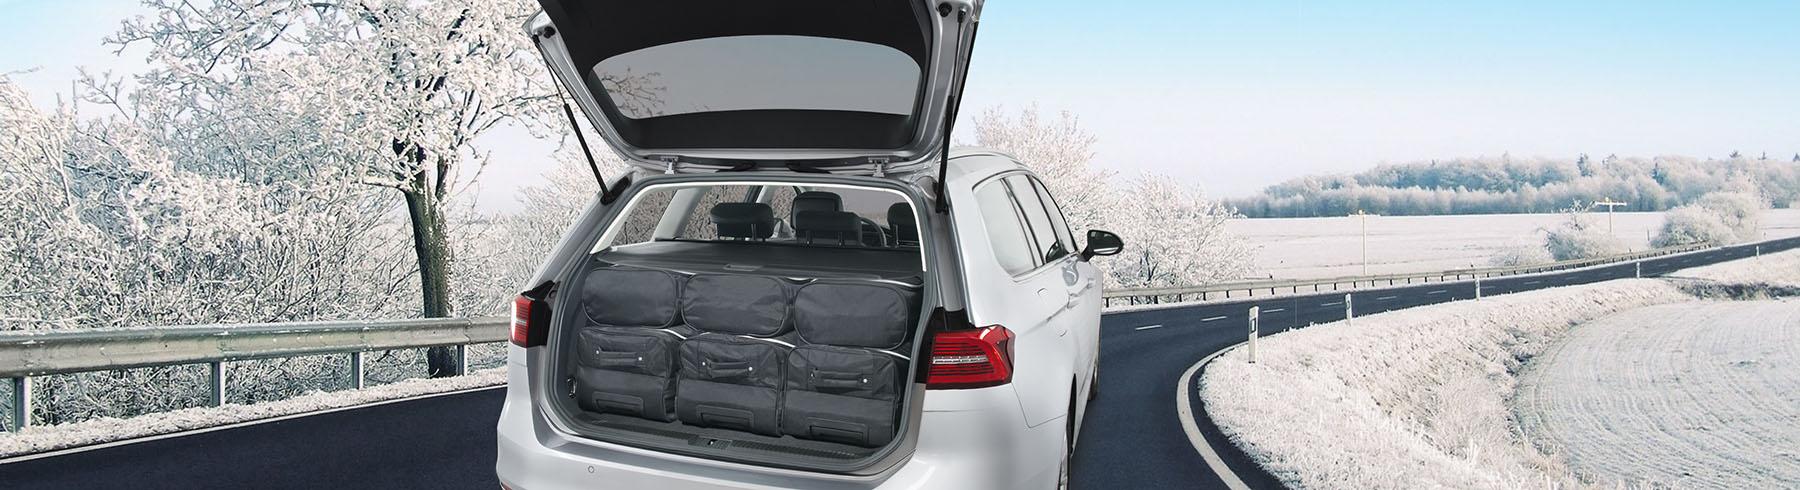 car-bags-concept-winter-03